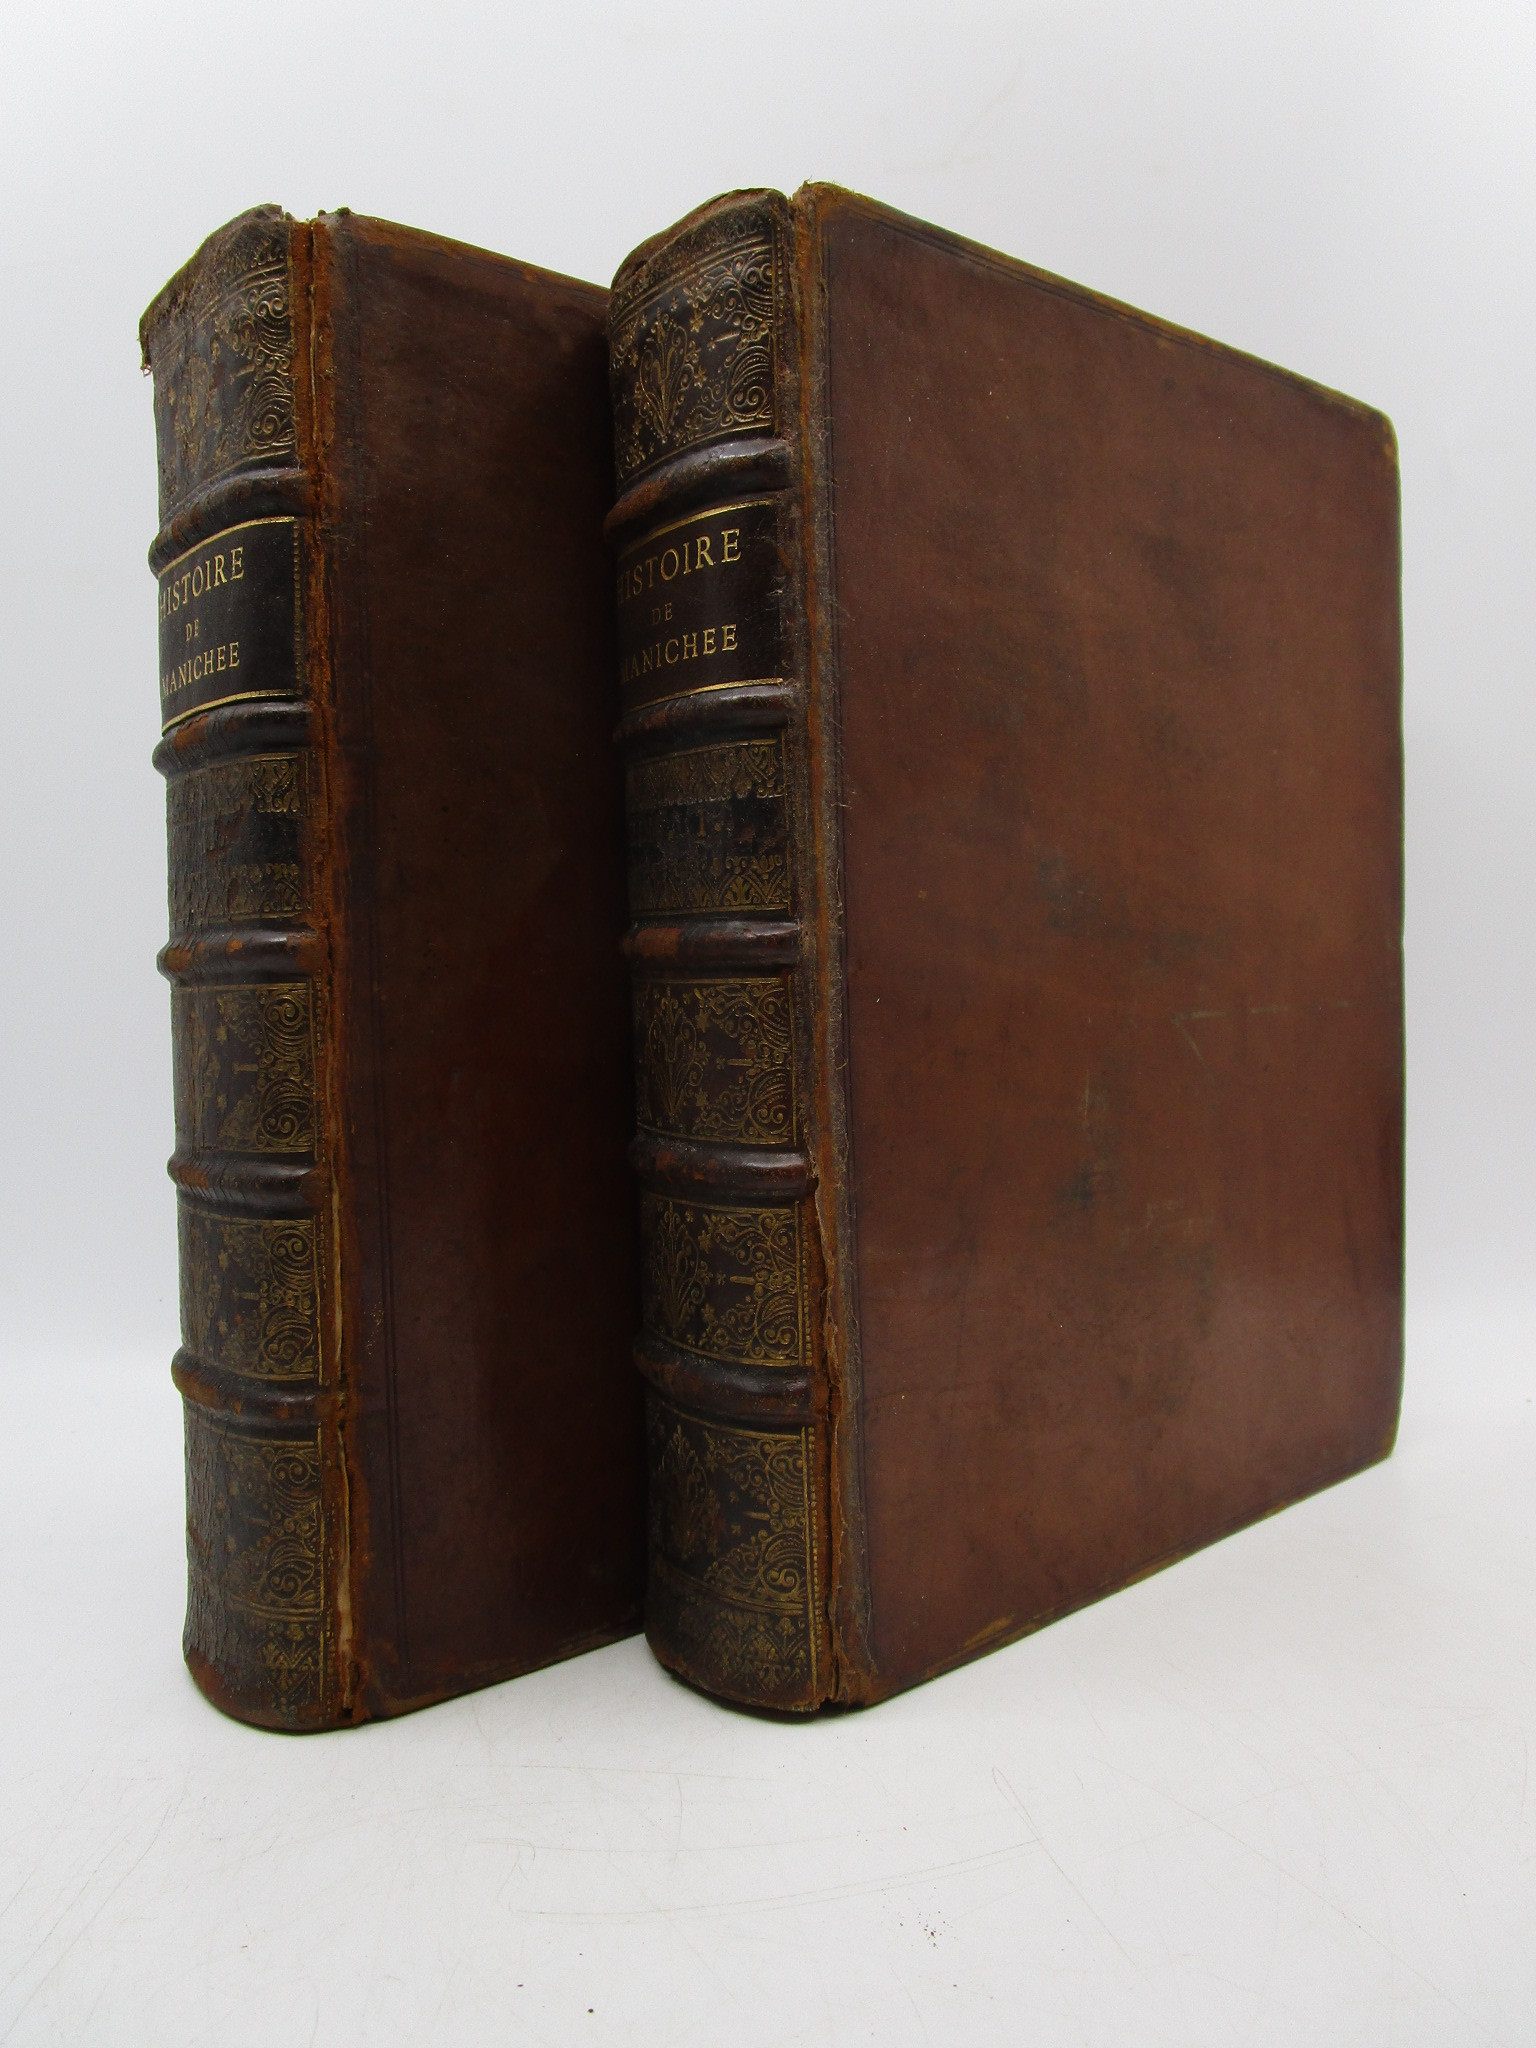 Image for Histoire de Manichee et du Manicheisme (Complete 2 Volume Set) First Edition